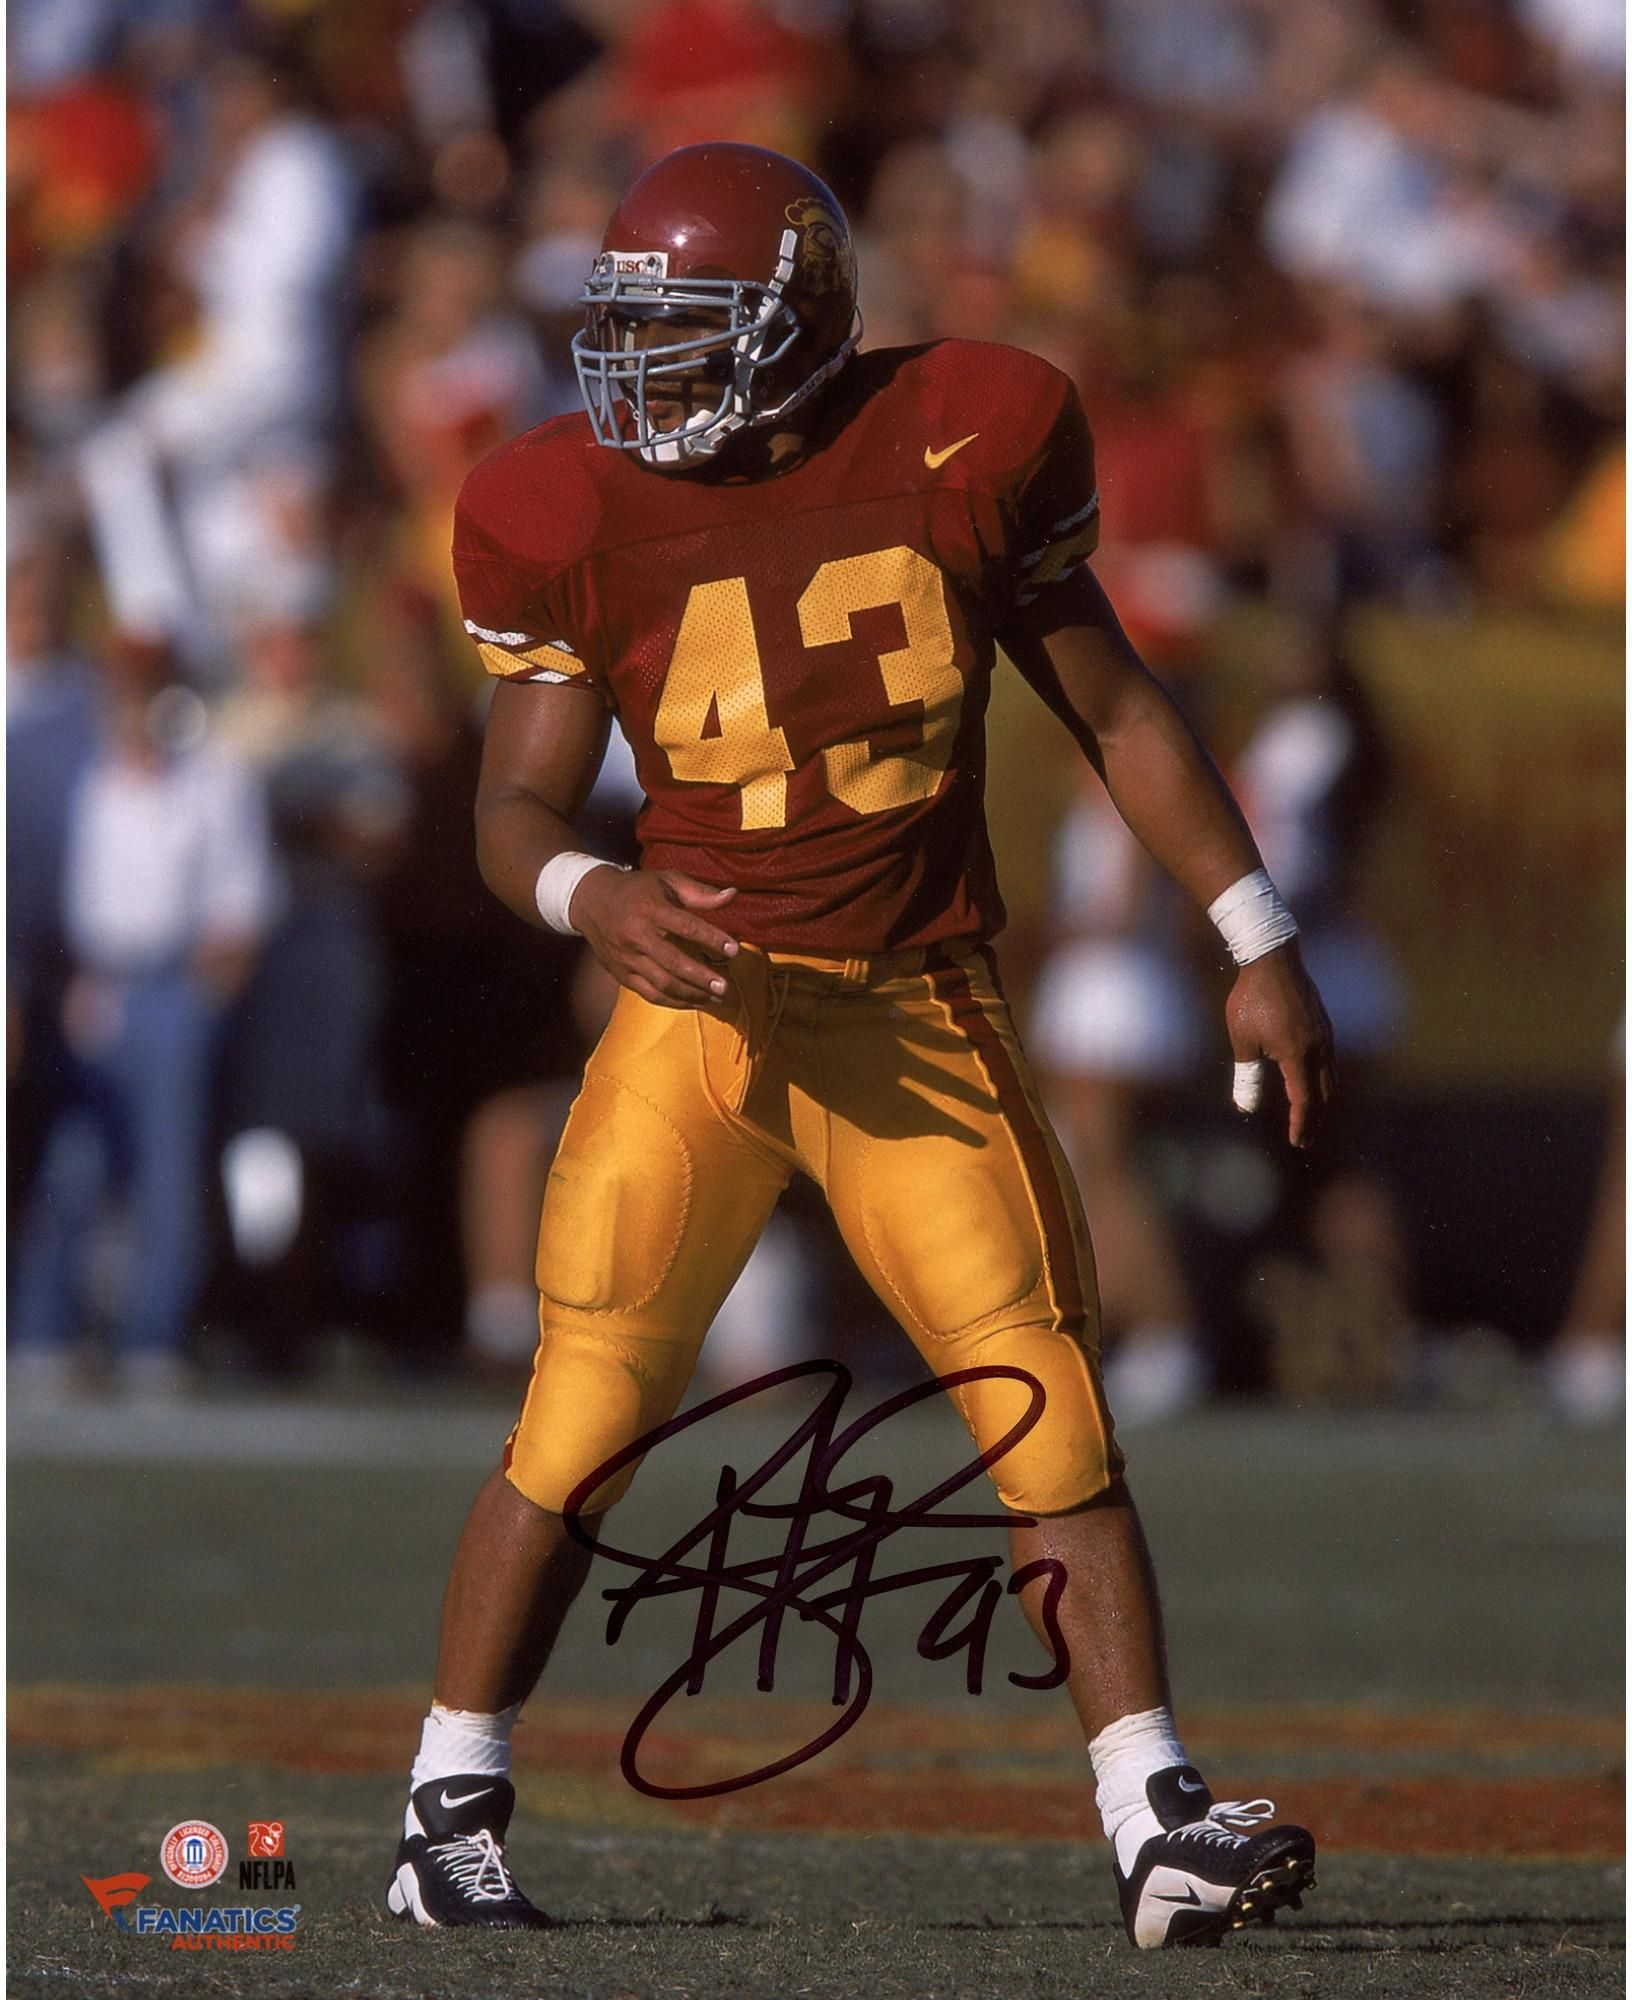 8fcbbbb0ed4 ... Football Jerseys Troy Polamalu USC Trojans Autographed ...